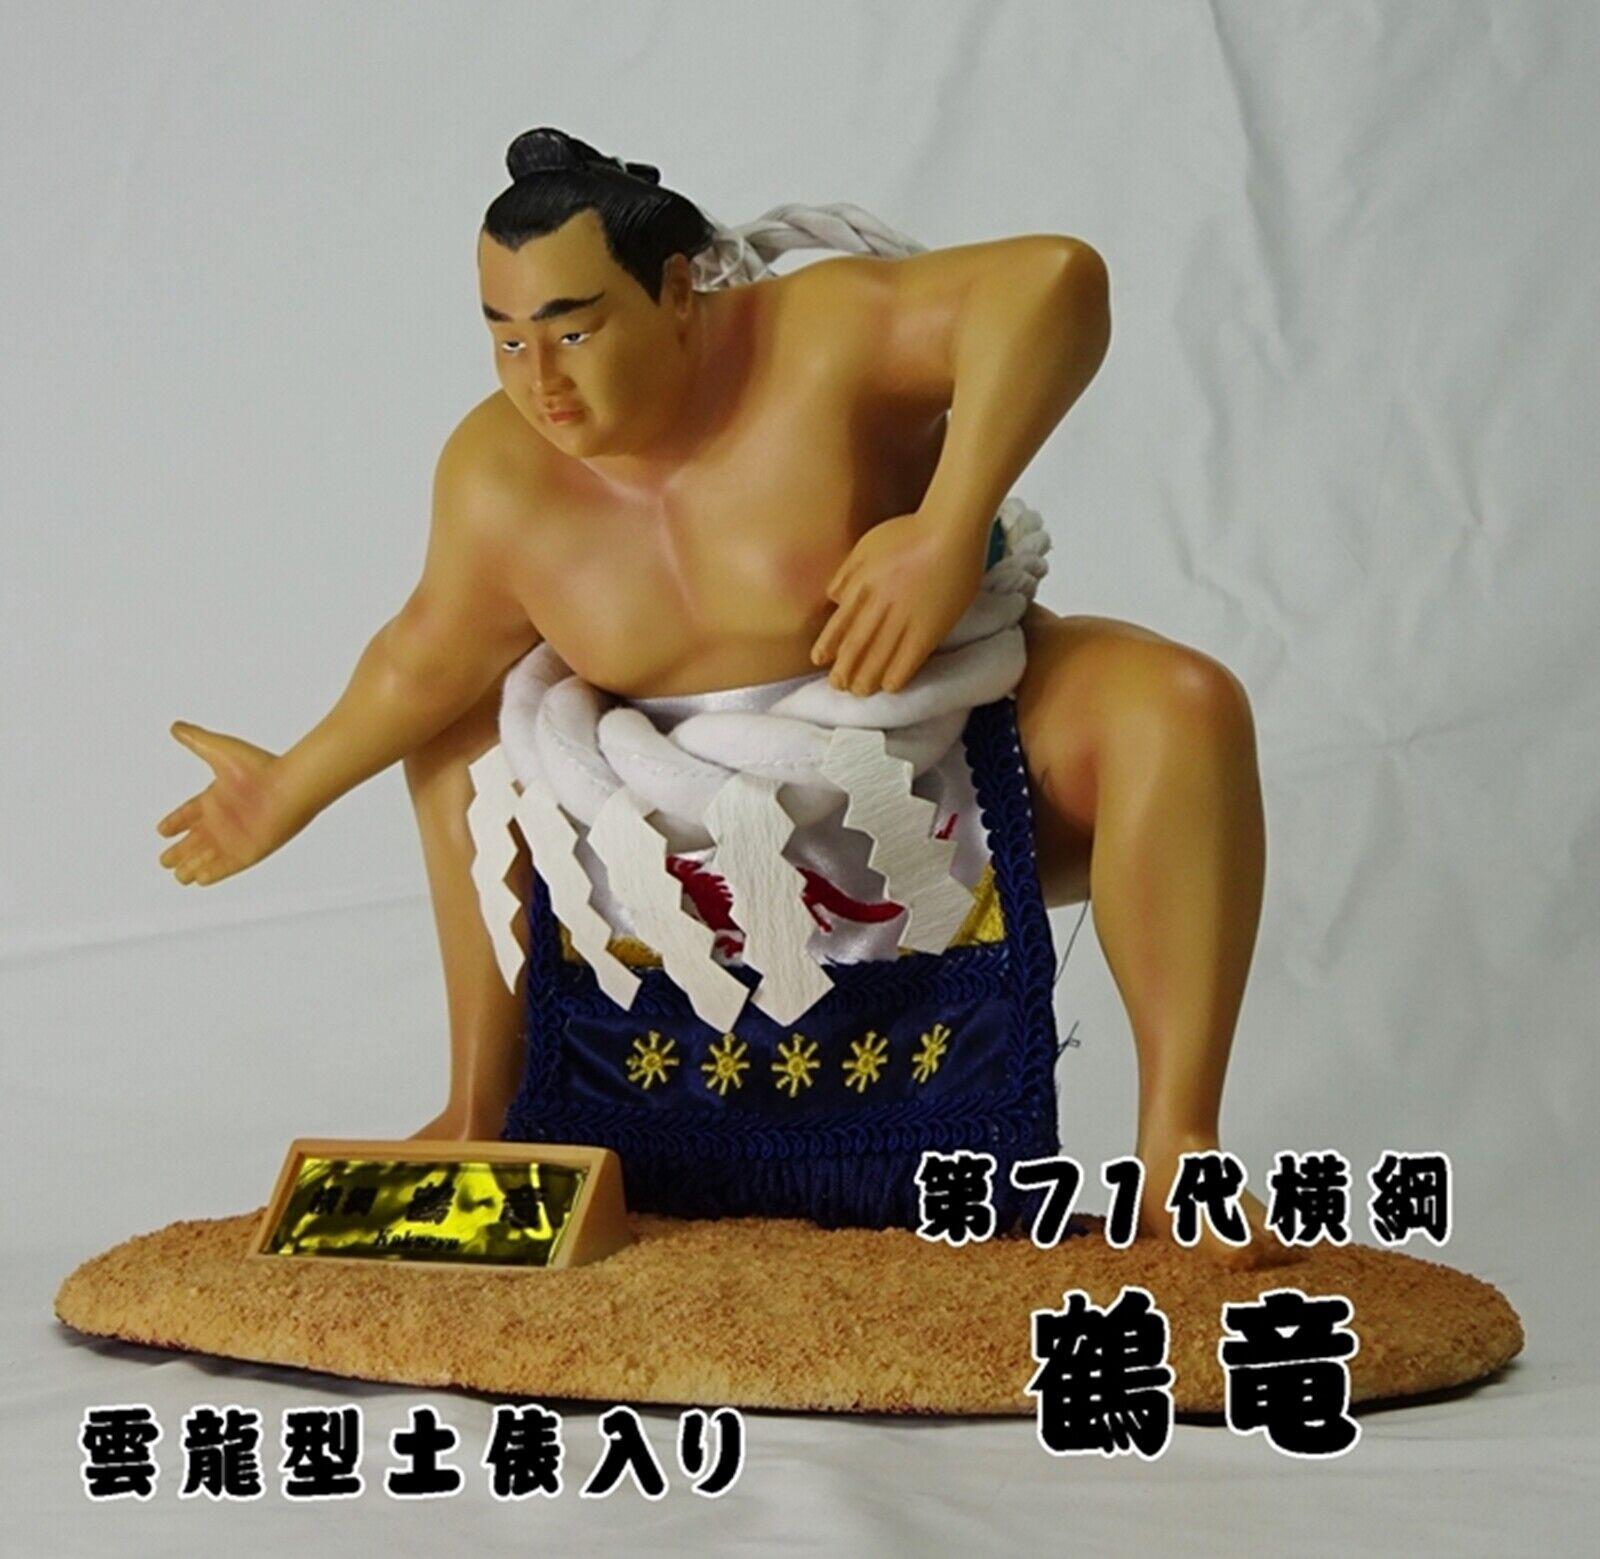 Kakuryu Japanisch Sumo Wrestler Figur Yokozuna Champion Rikishi von Japan